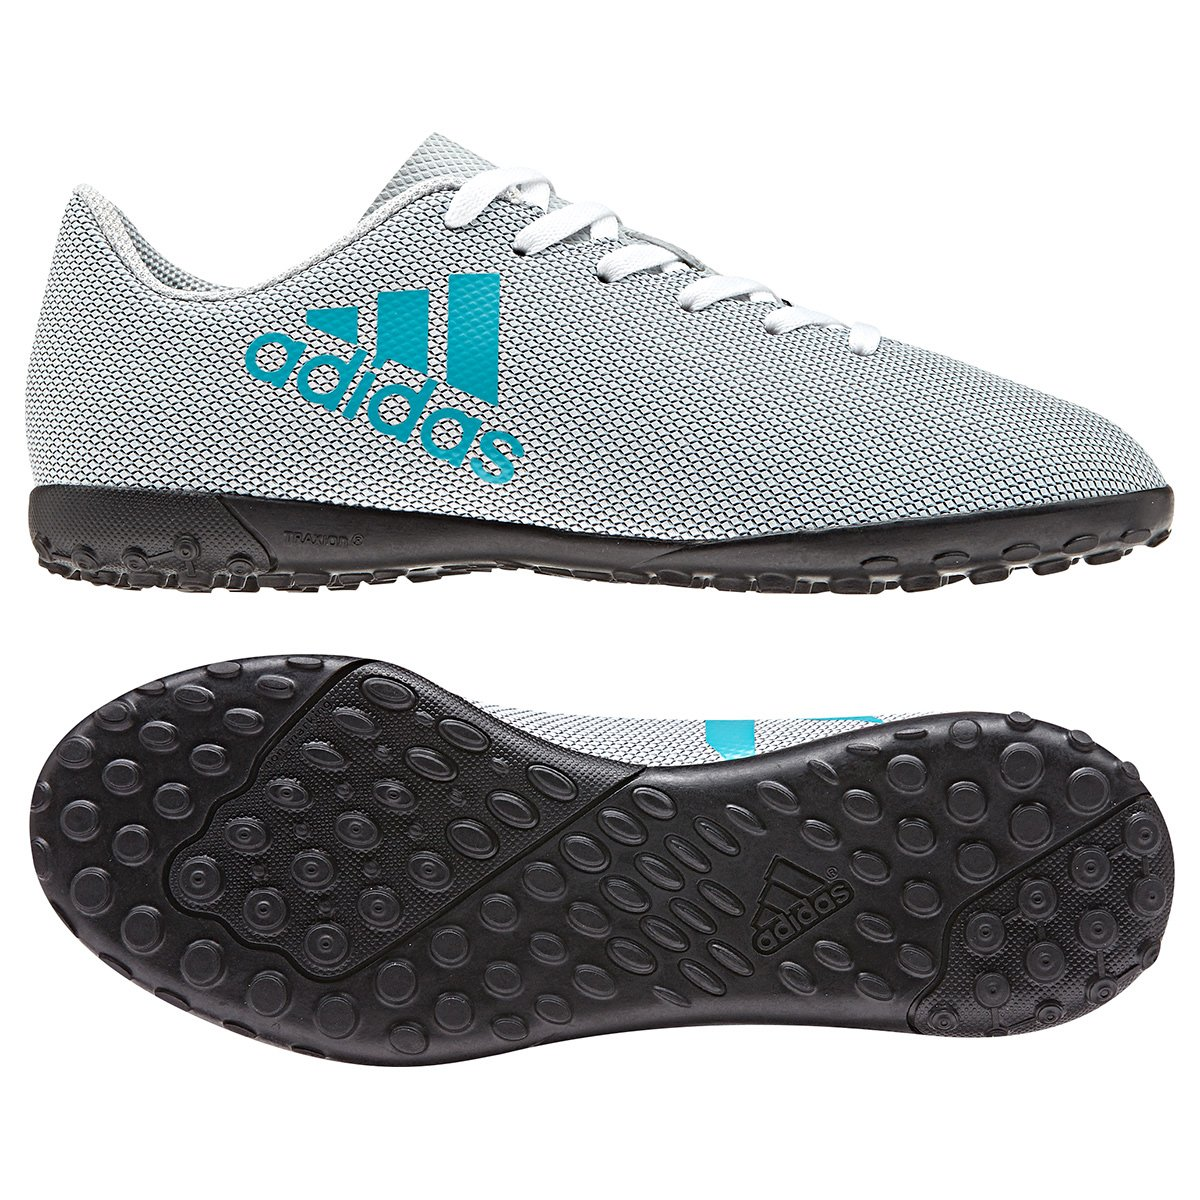 fc6a6dafe3 Chuteira Society Infantil Adidas X 17.4 TF